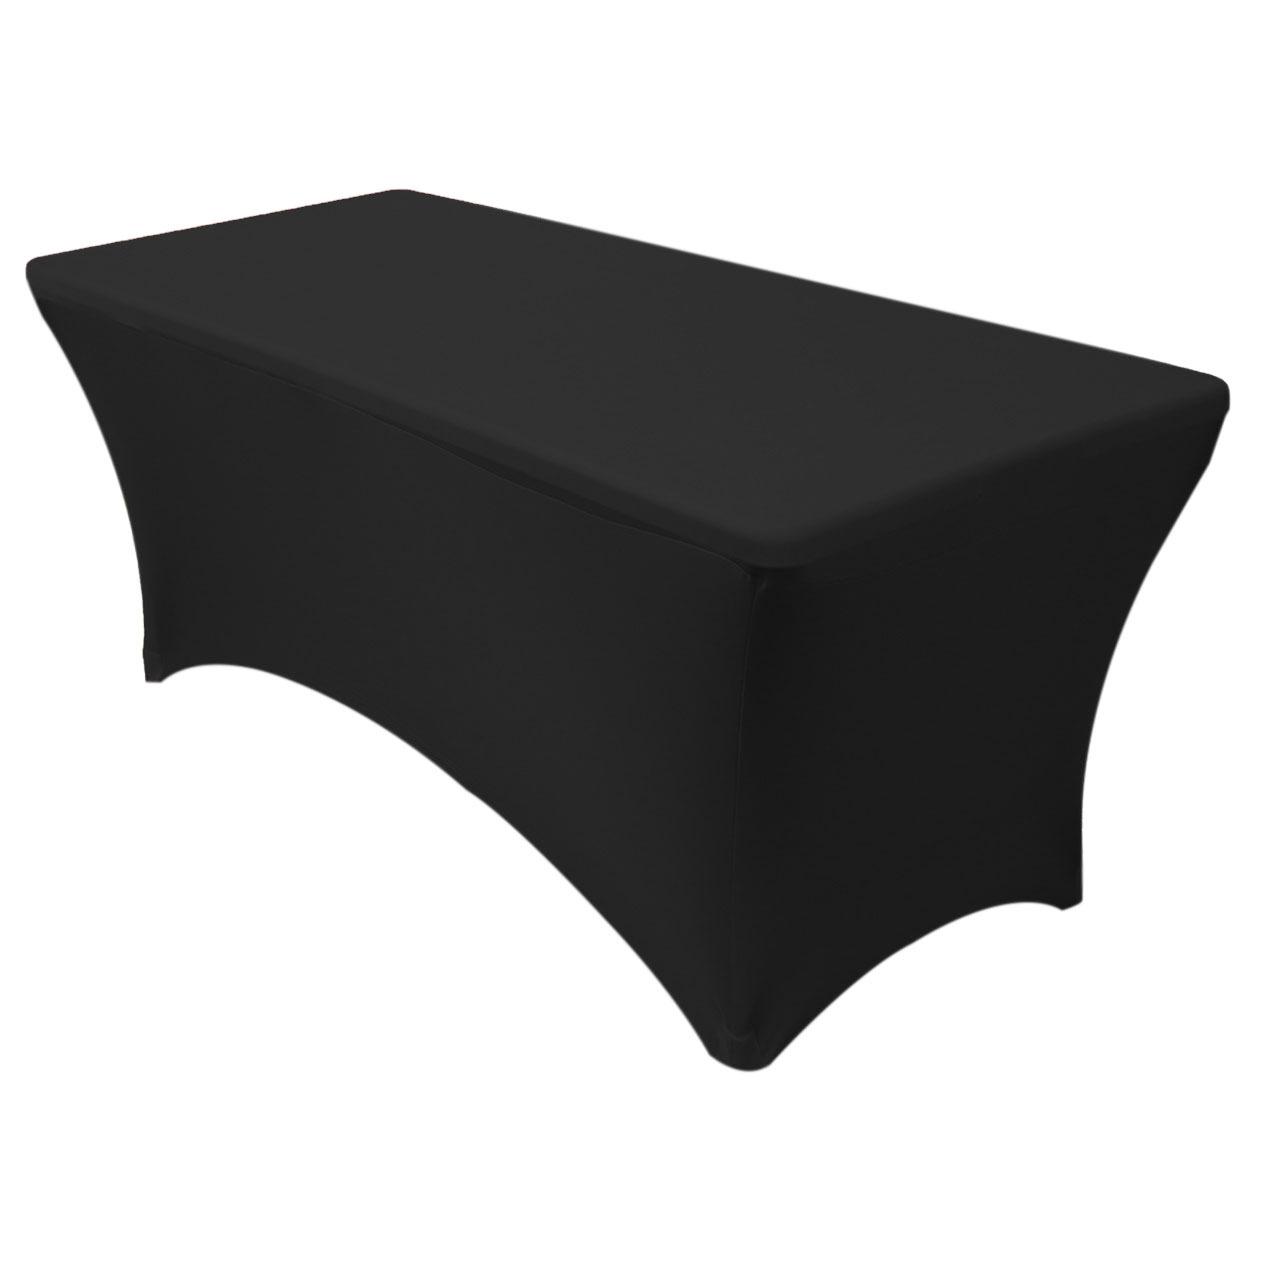 6ft rectangular spandex tablecloth black